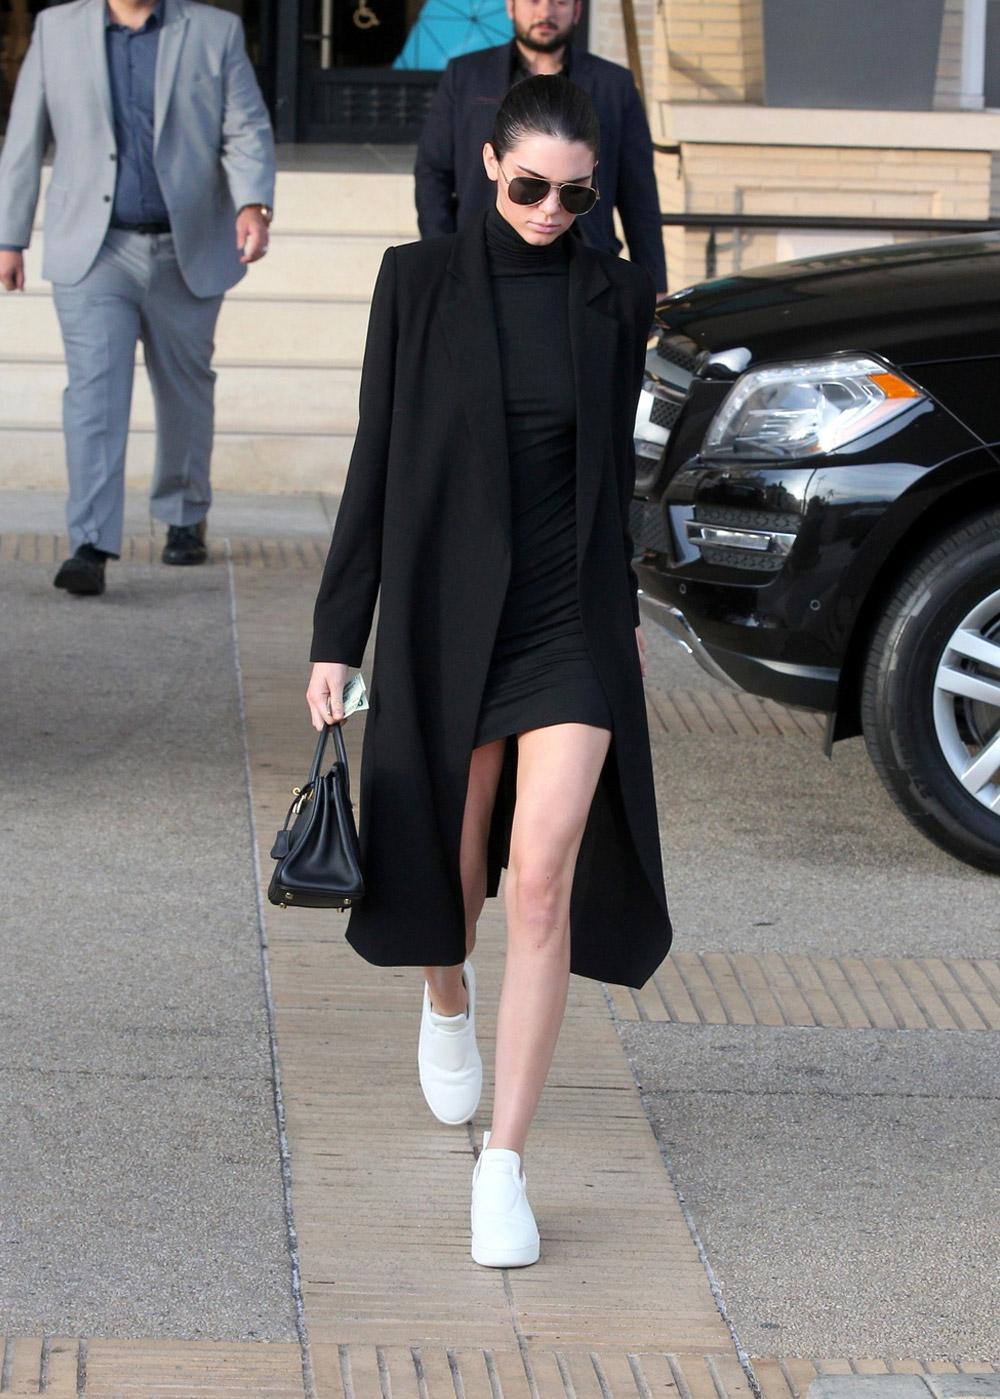 Kendal Jenner black outfit